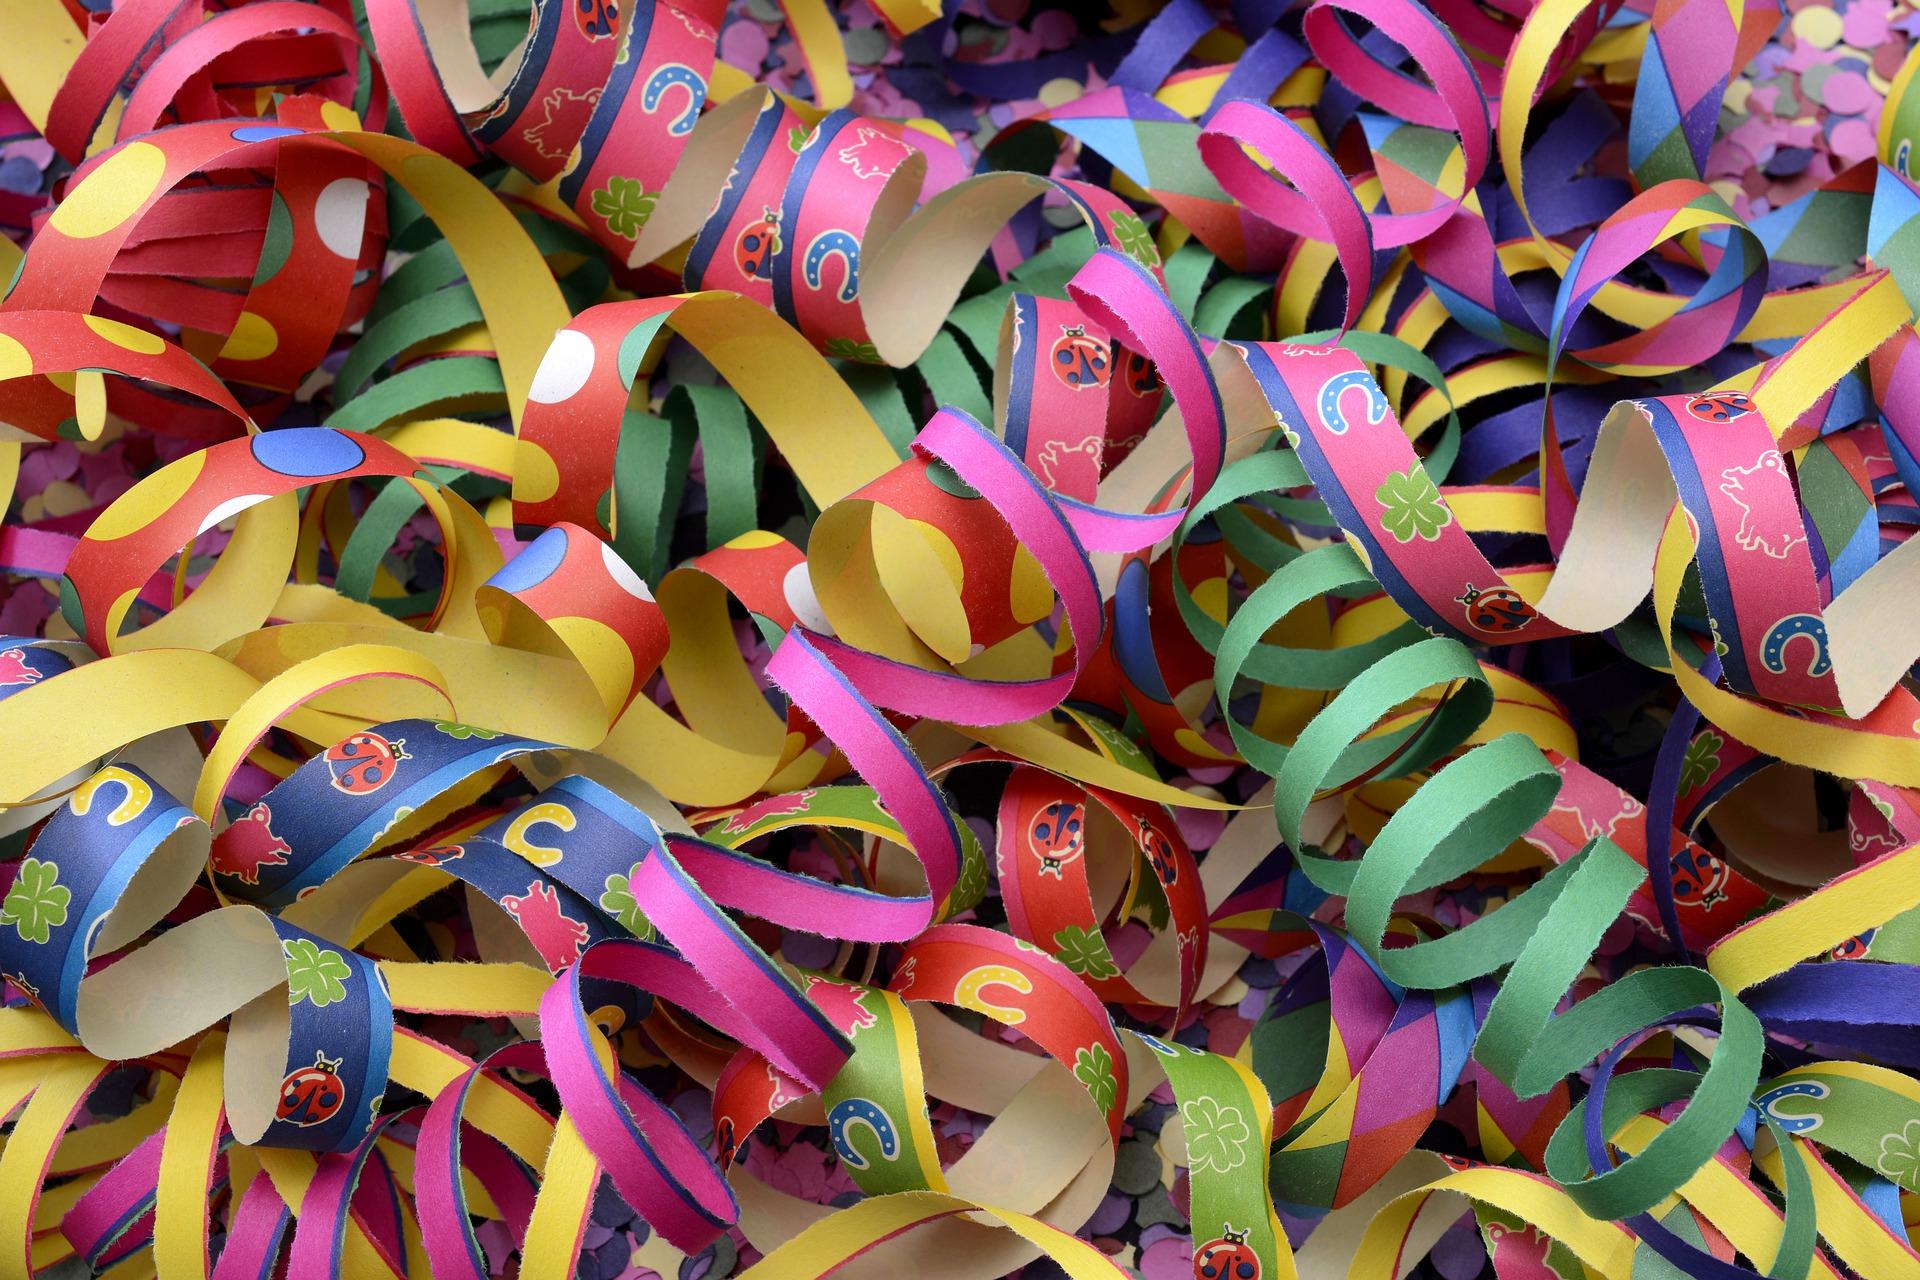 Fasching_Karneval @ZPARTNER. Fasching Karneval 2021 mit bunten Luftschlangen